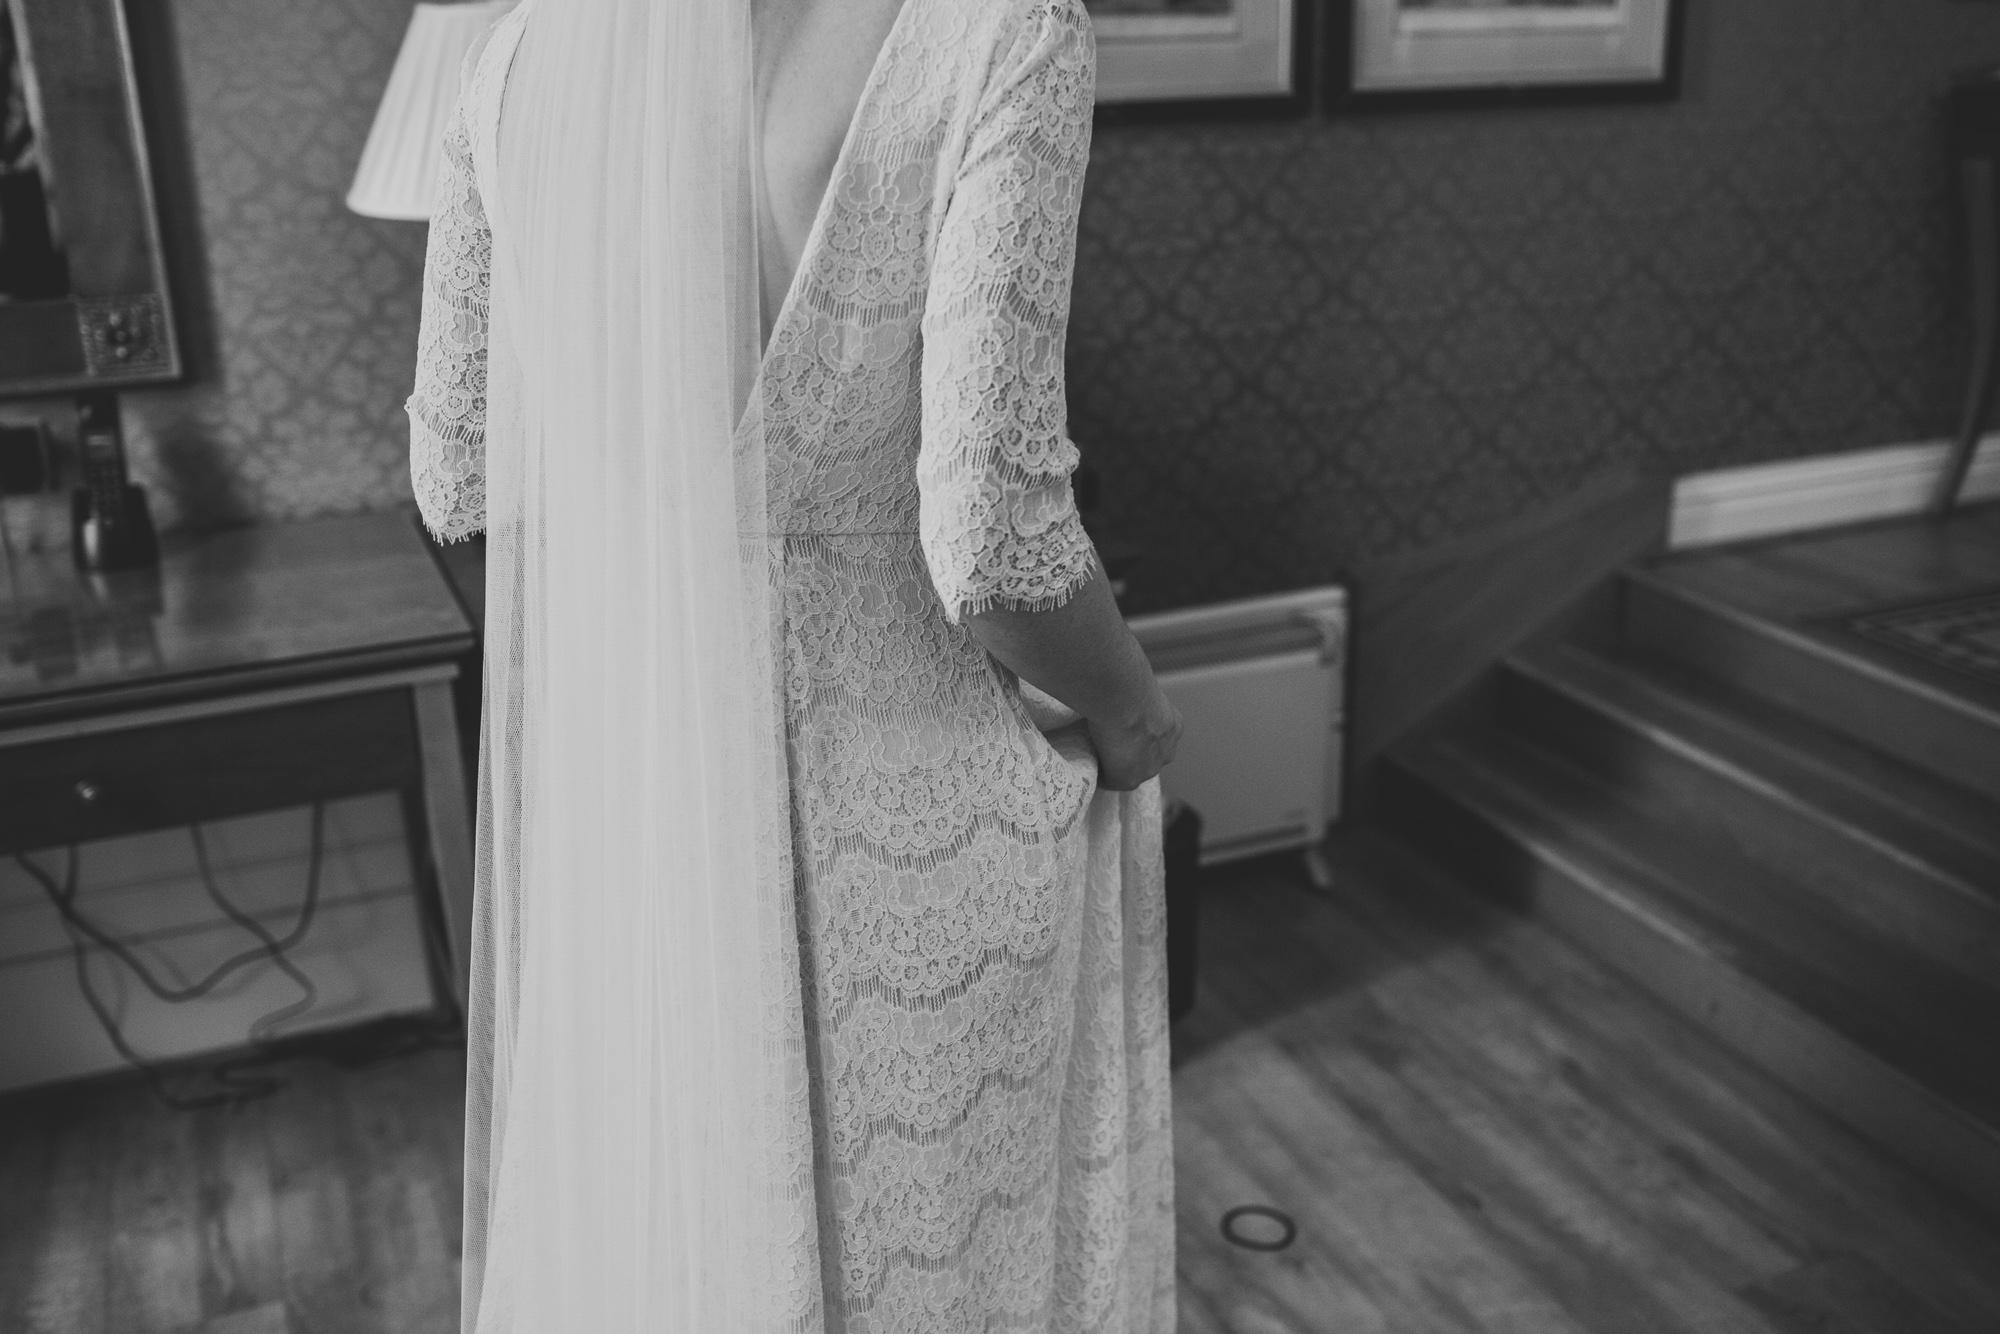 Kate-Beaumont-Lace-Flared-Dahlia-Gown-Leeds-Wedding-Bloom-Weddings-6.jpg